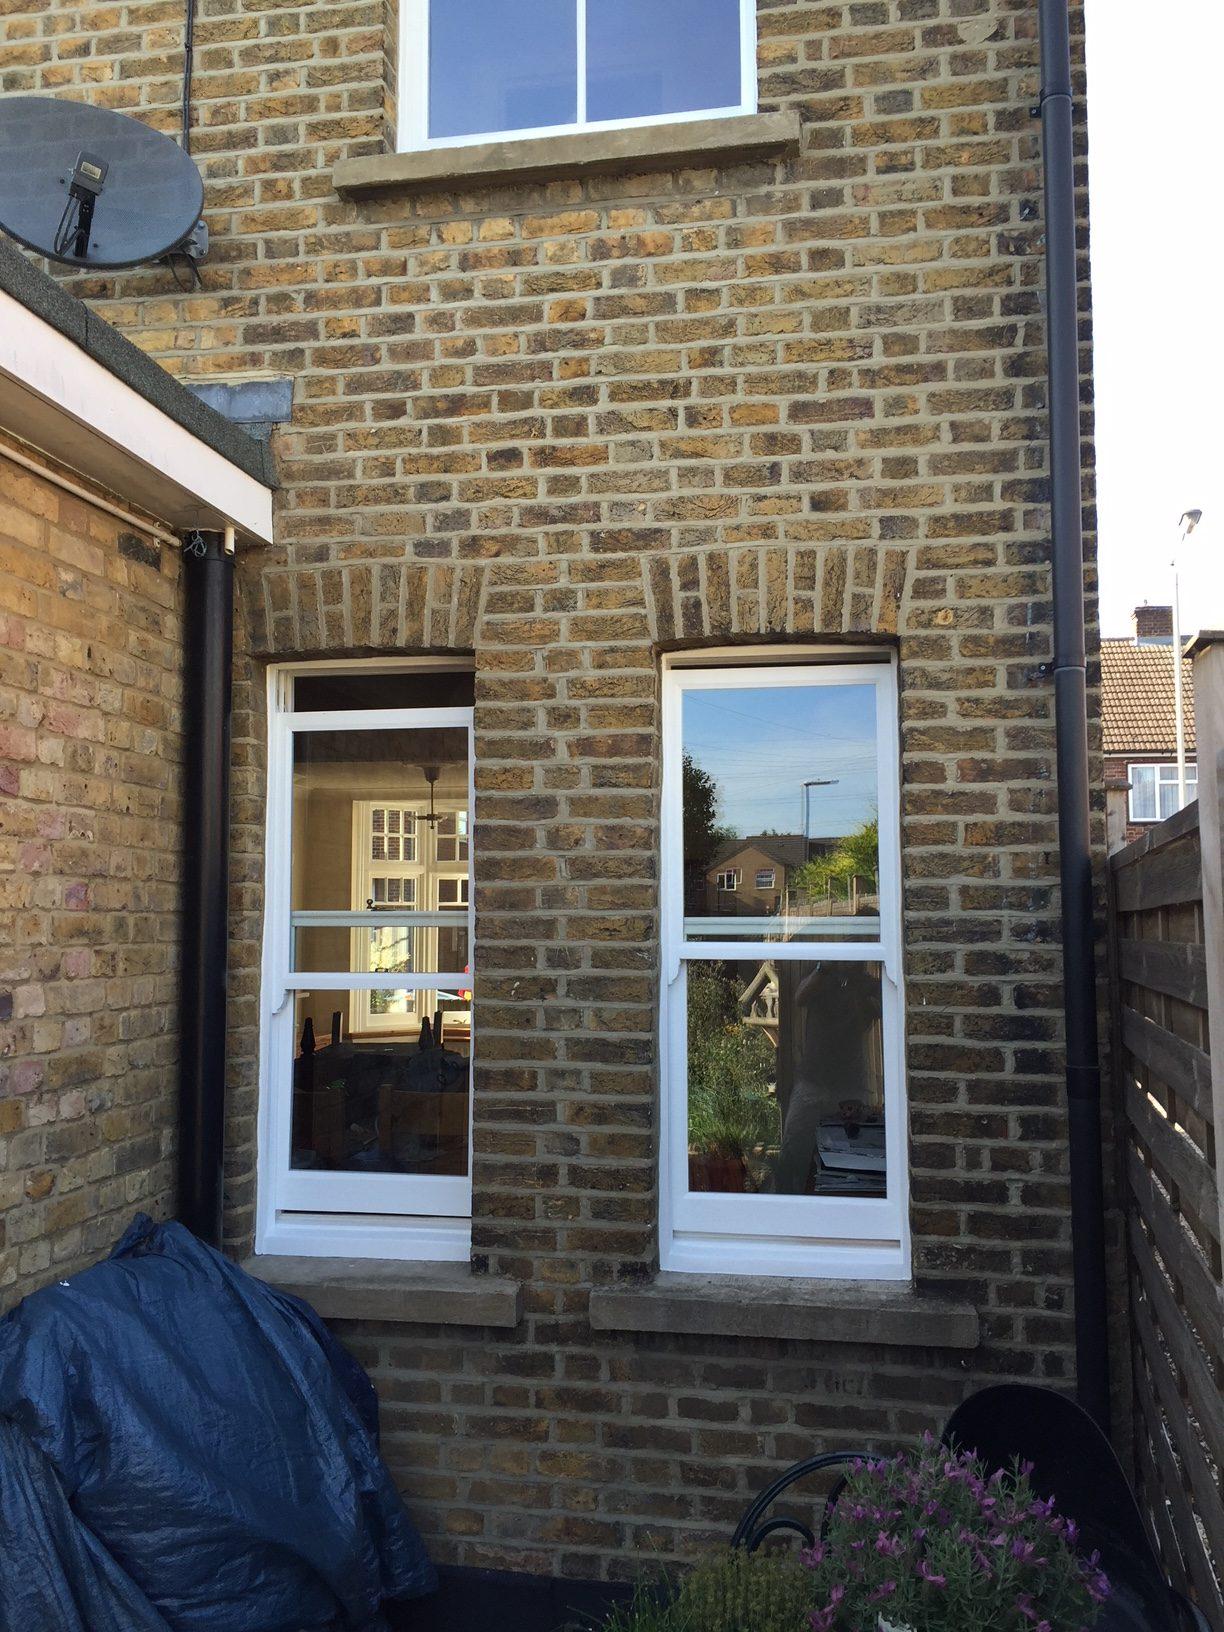 Hoddesdon sash windows restored to their former glory